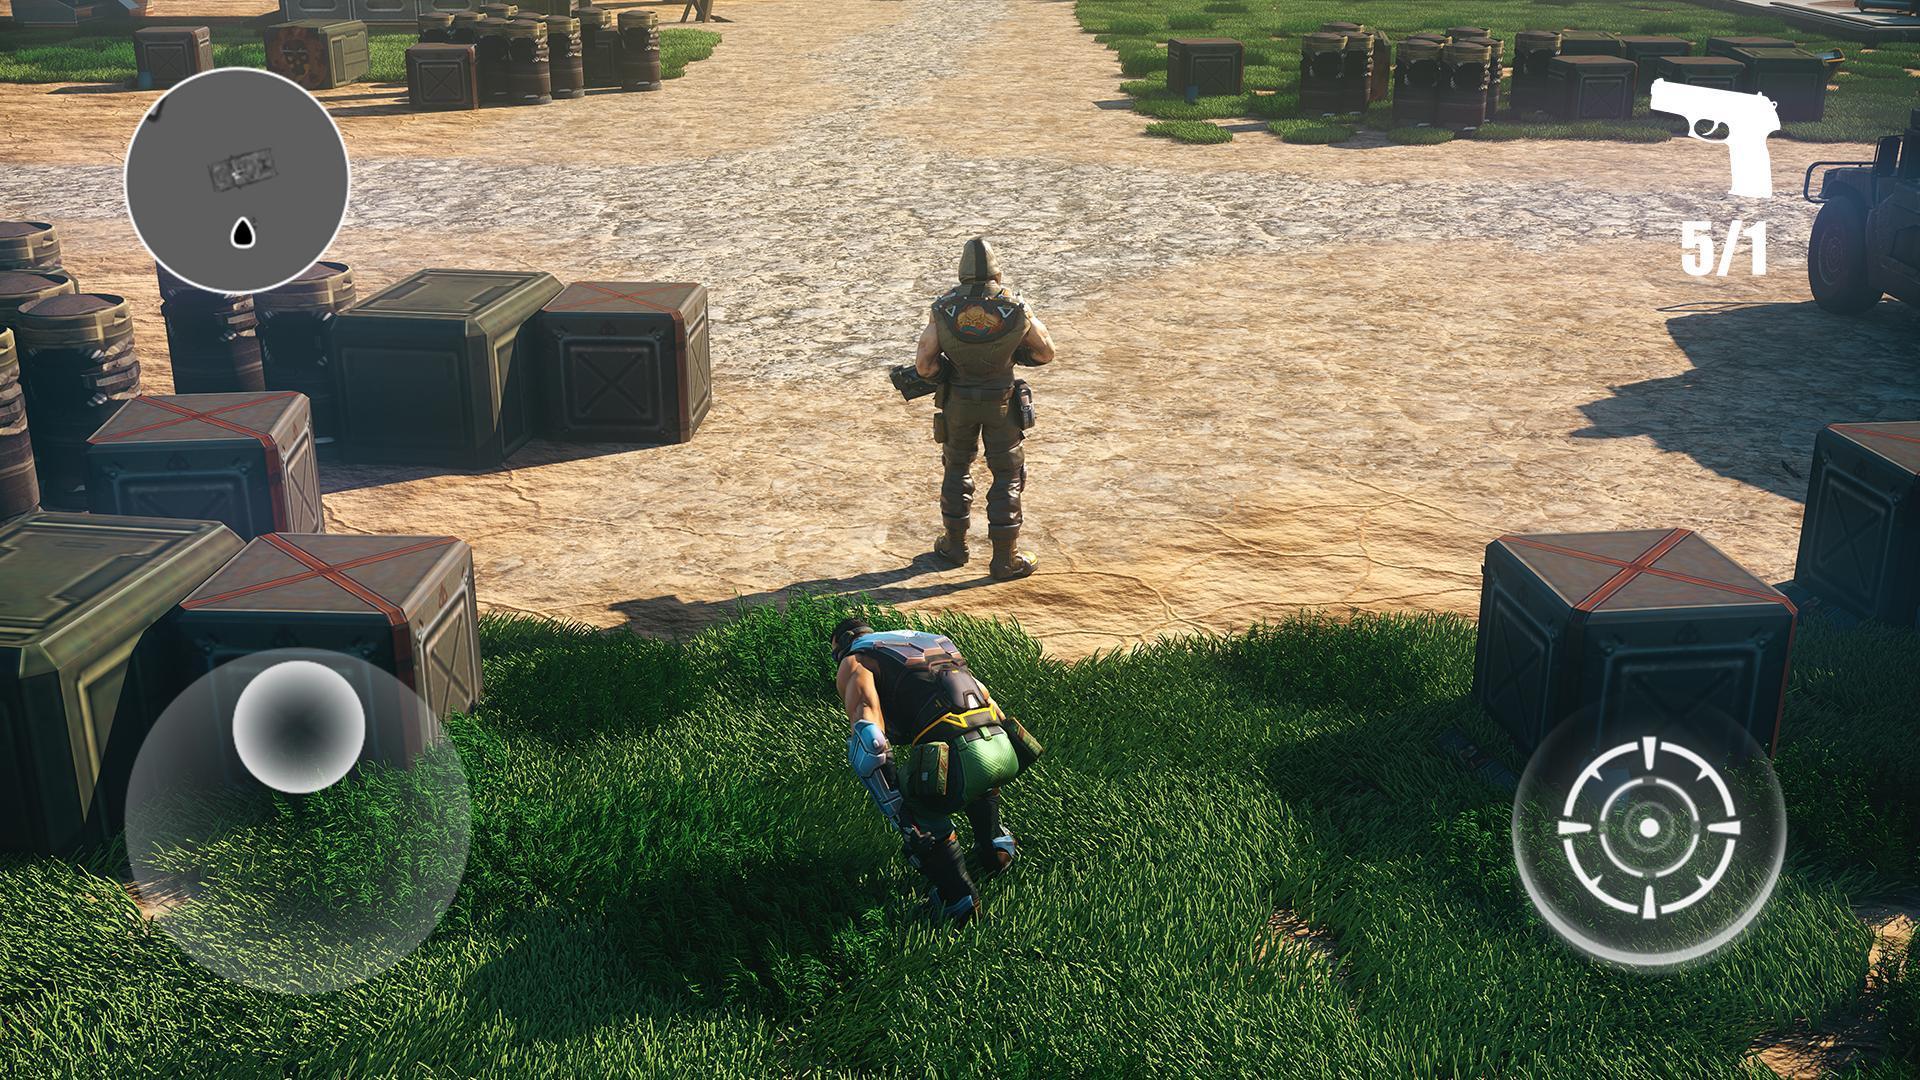 Evolution 2 Battle for Utopia. Action games 0.580.78866 Screenshot 12